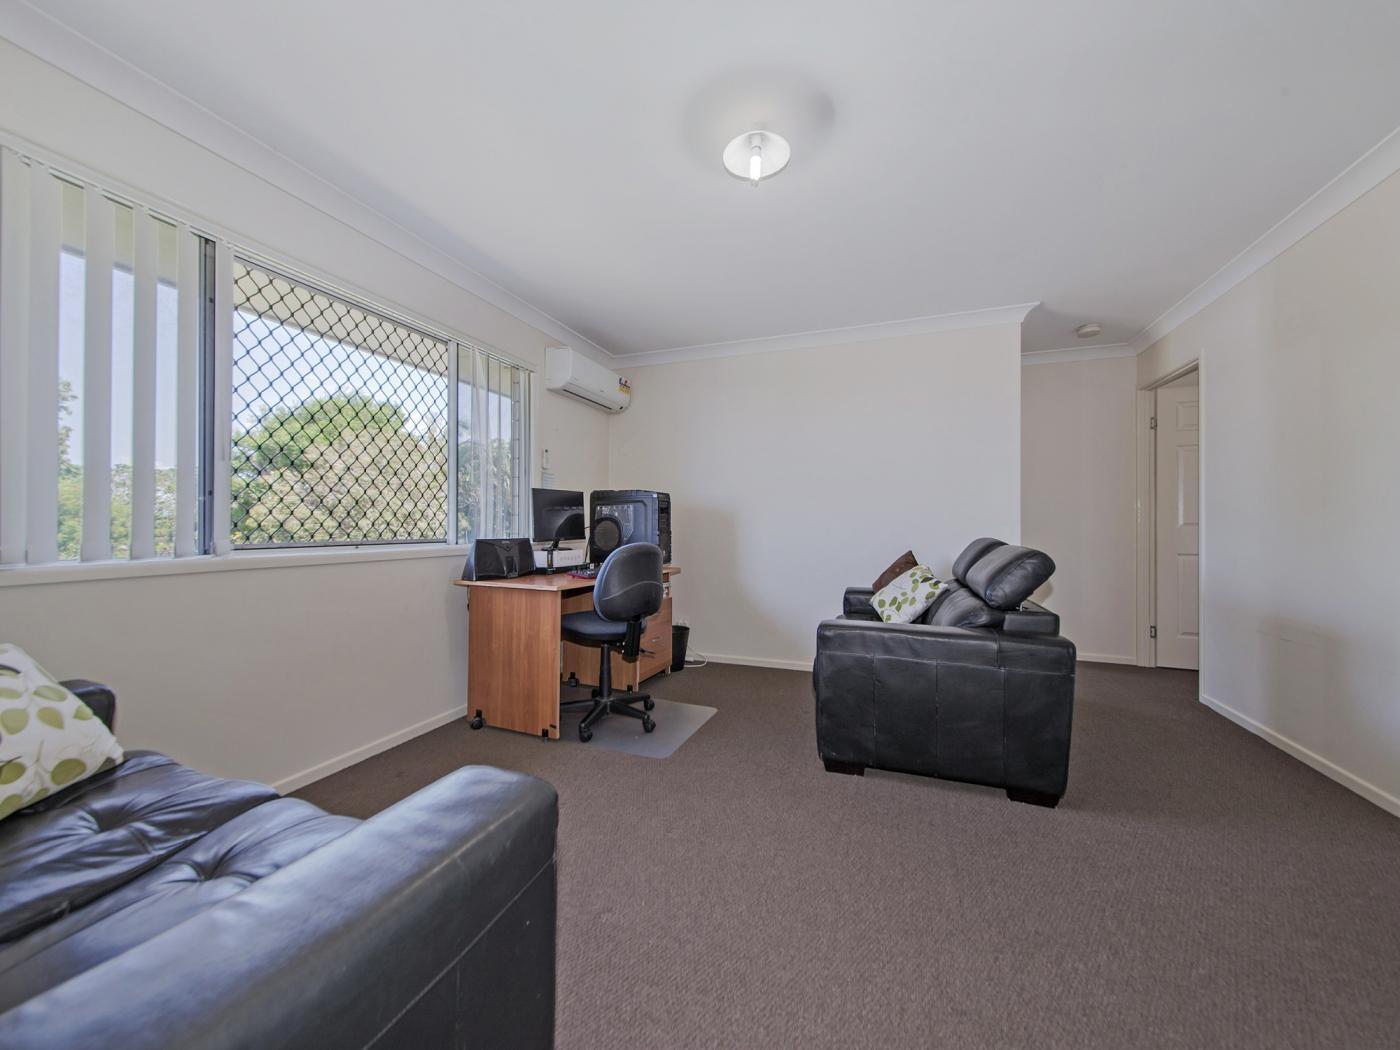 31 kitchener street wynnum qld 4178 sale rental history property 360